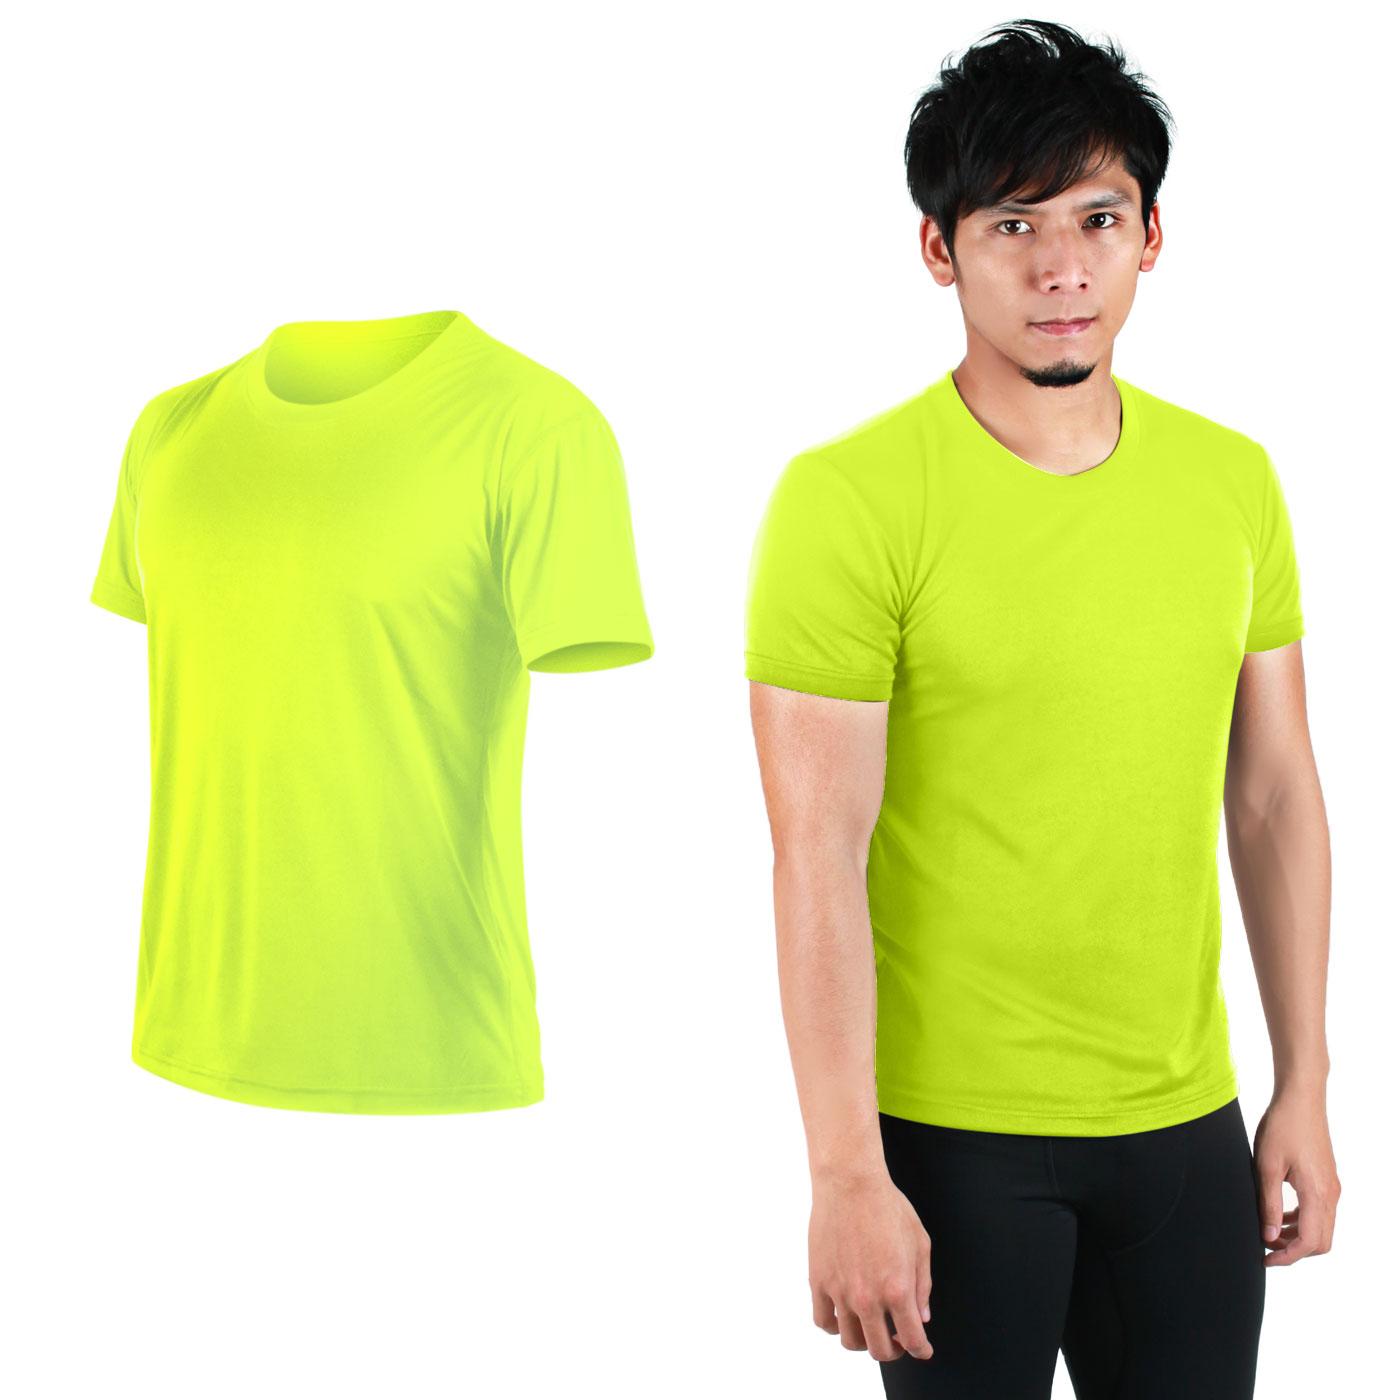 HODARLA FLARE 100 吸濕排汗衫3108301 - 螢光黃